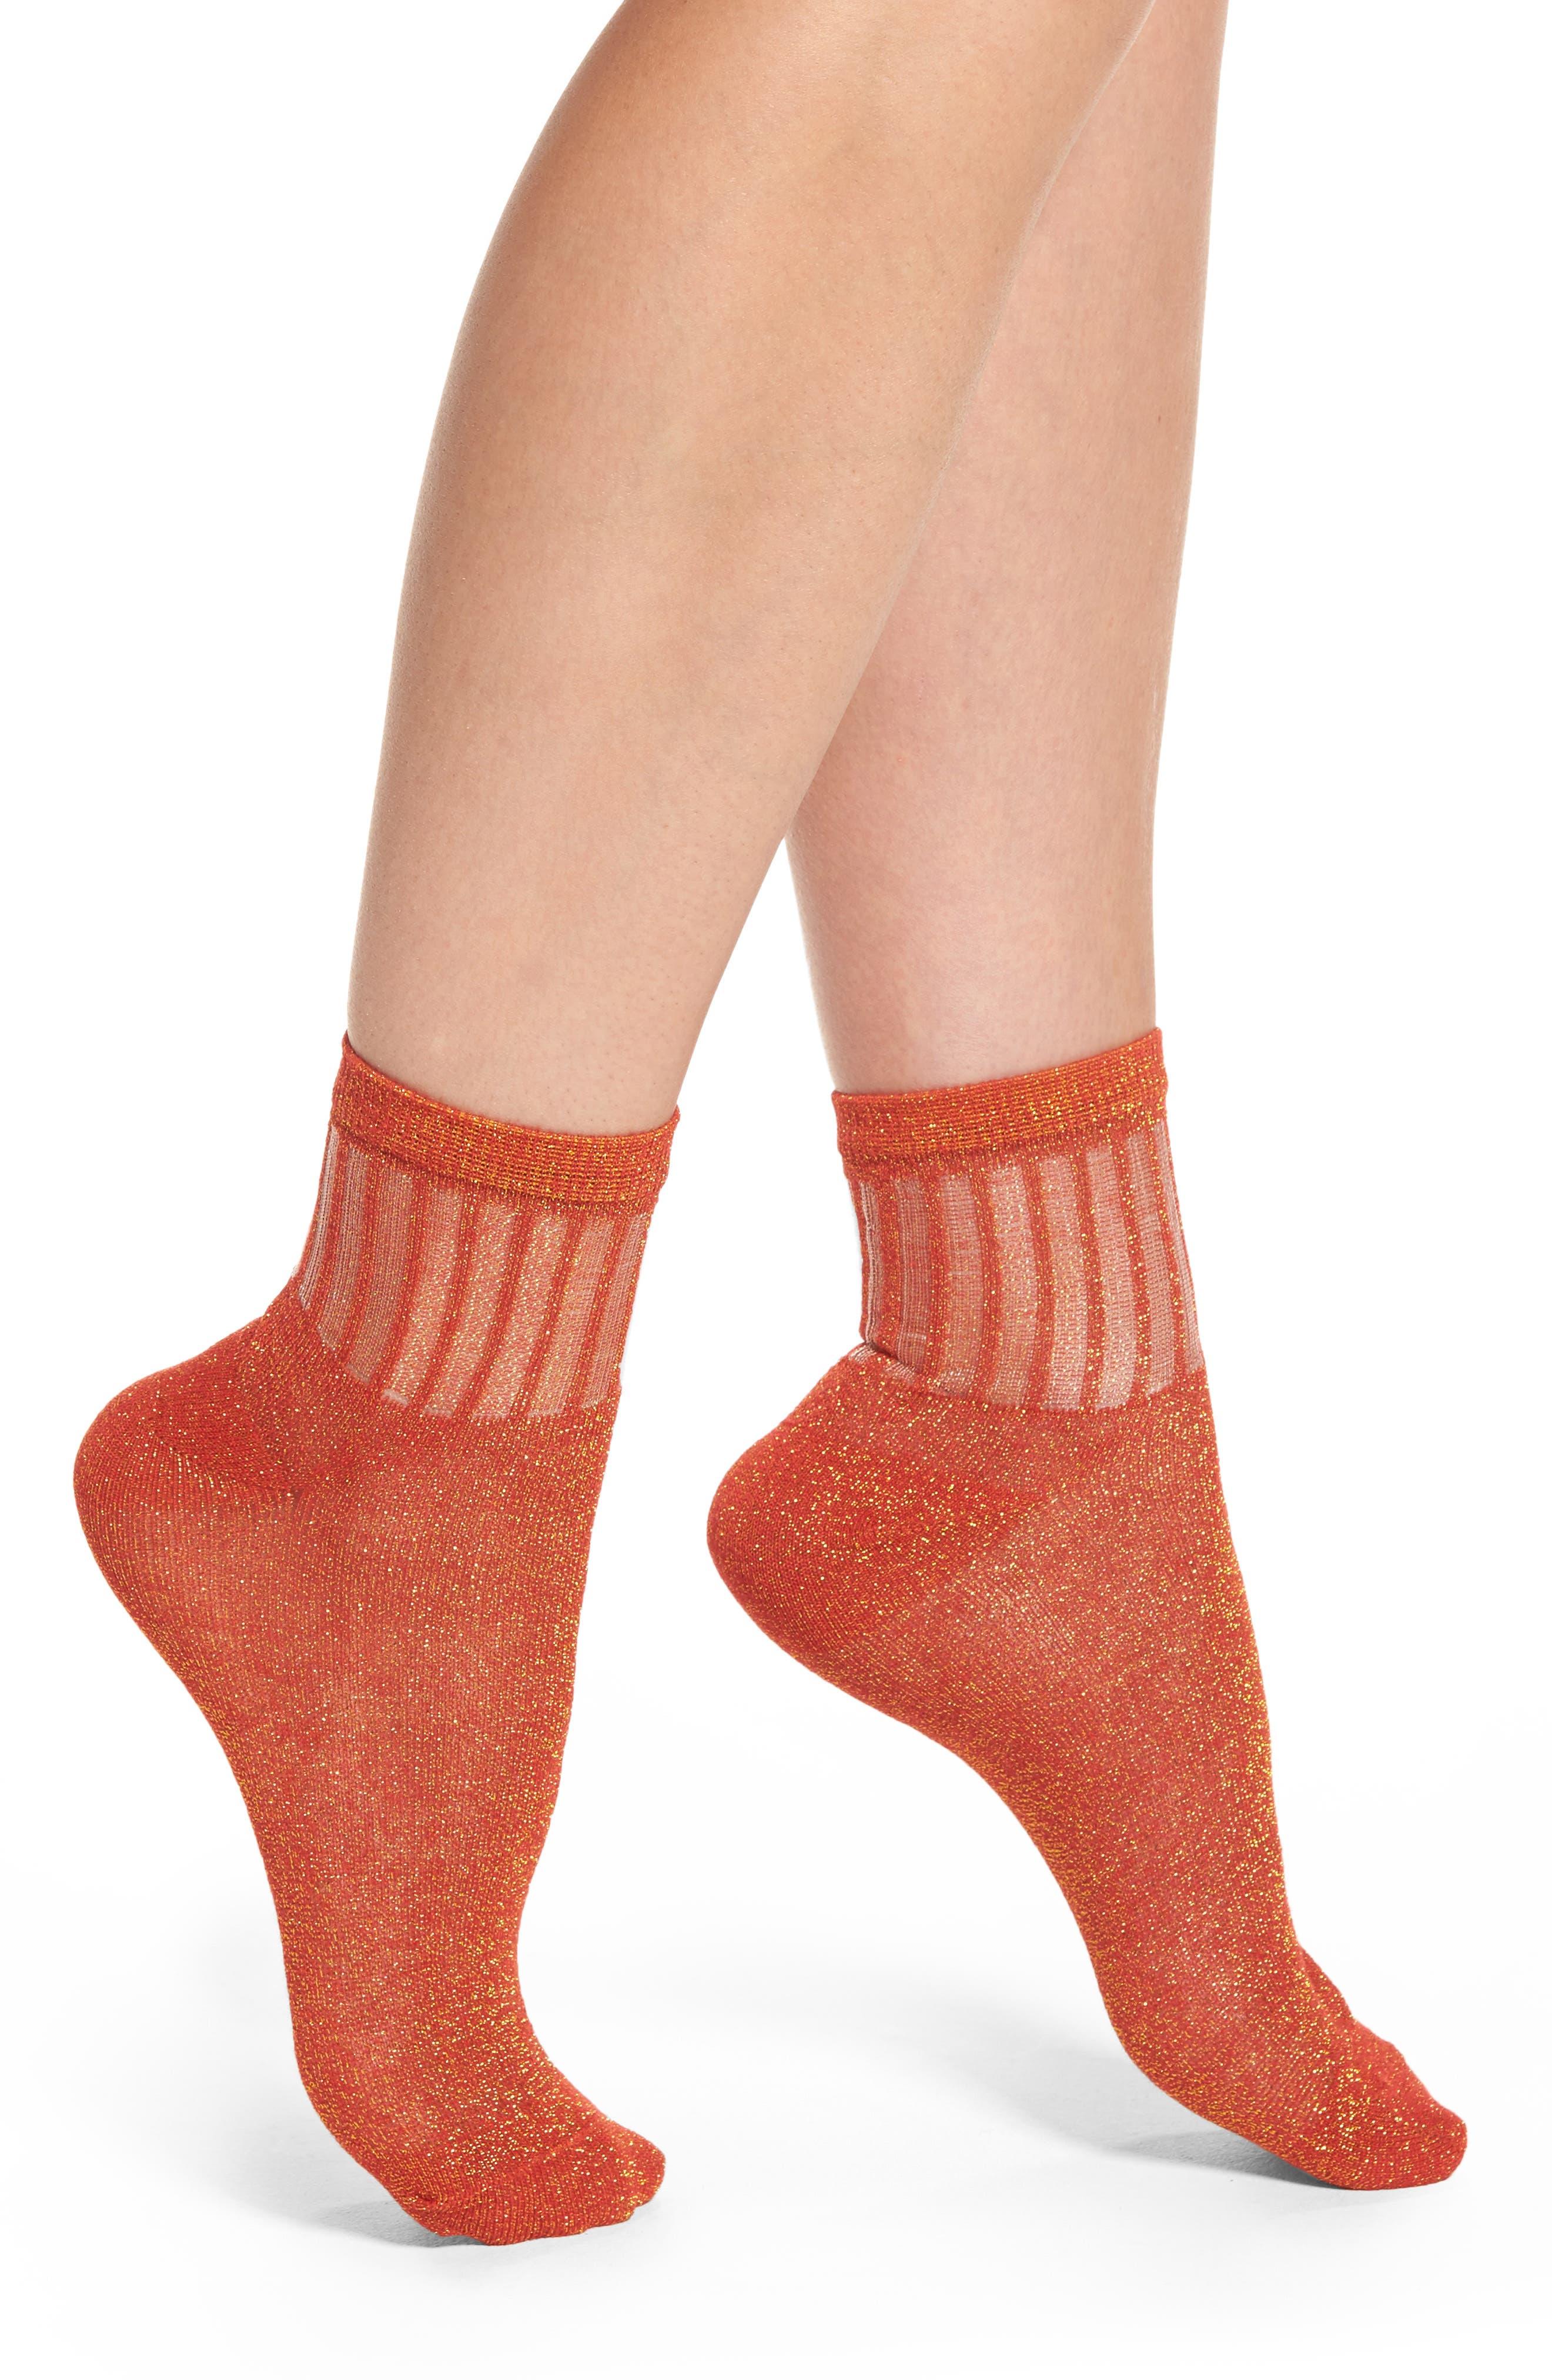 Alternate Image 1 Selected - Free People Roseland Metallic Ankle Socks